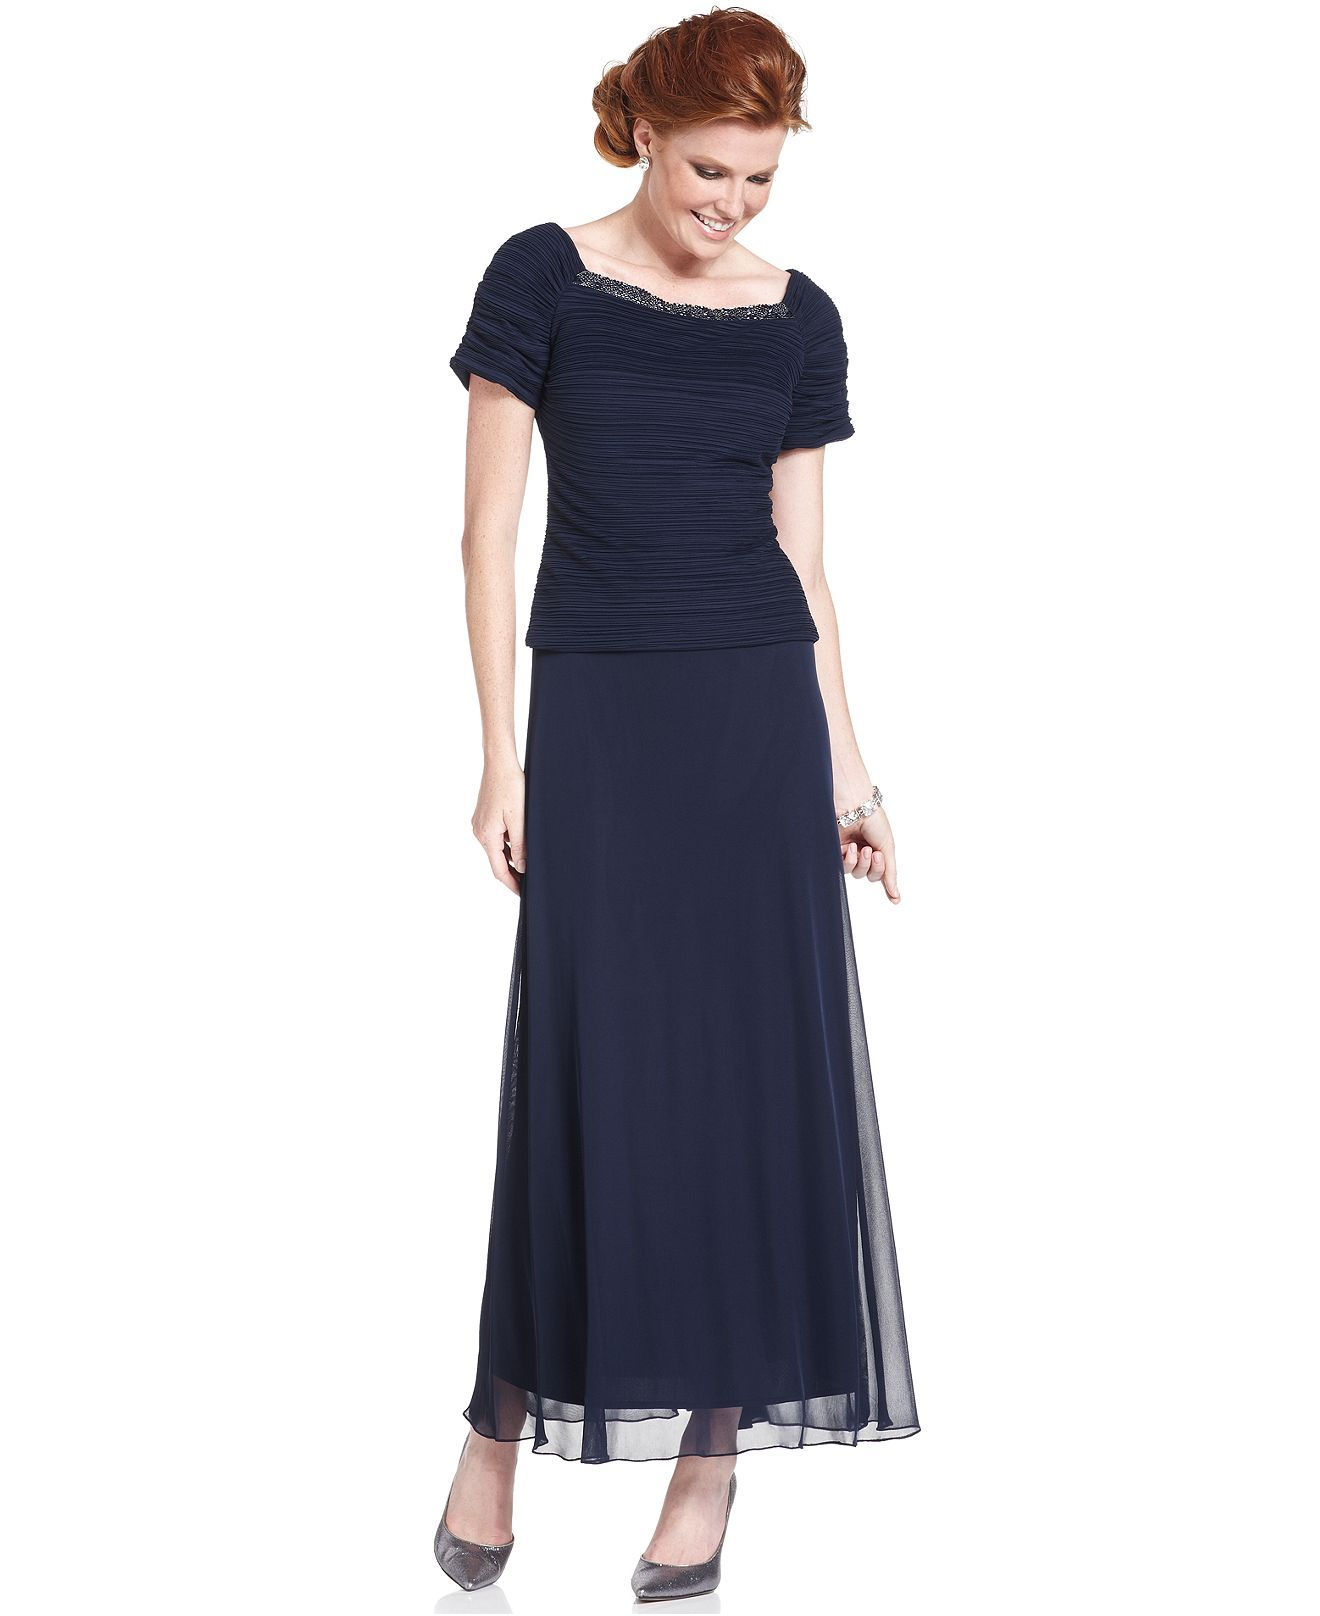 Patra Dress Short Sleeve Beaded Gown Womens Dresses